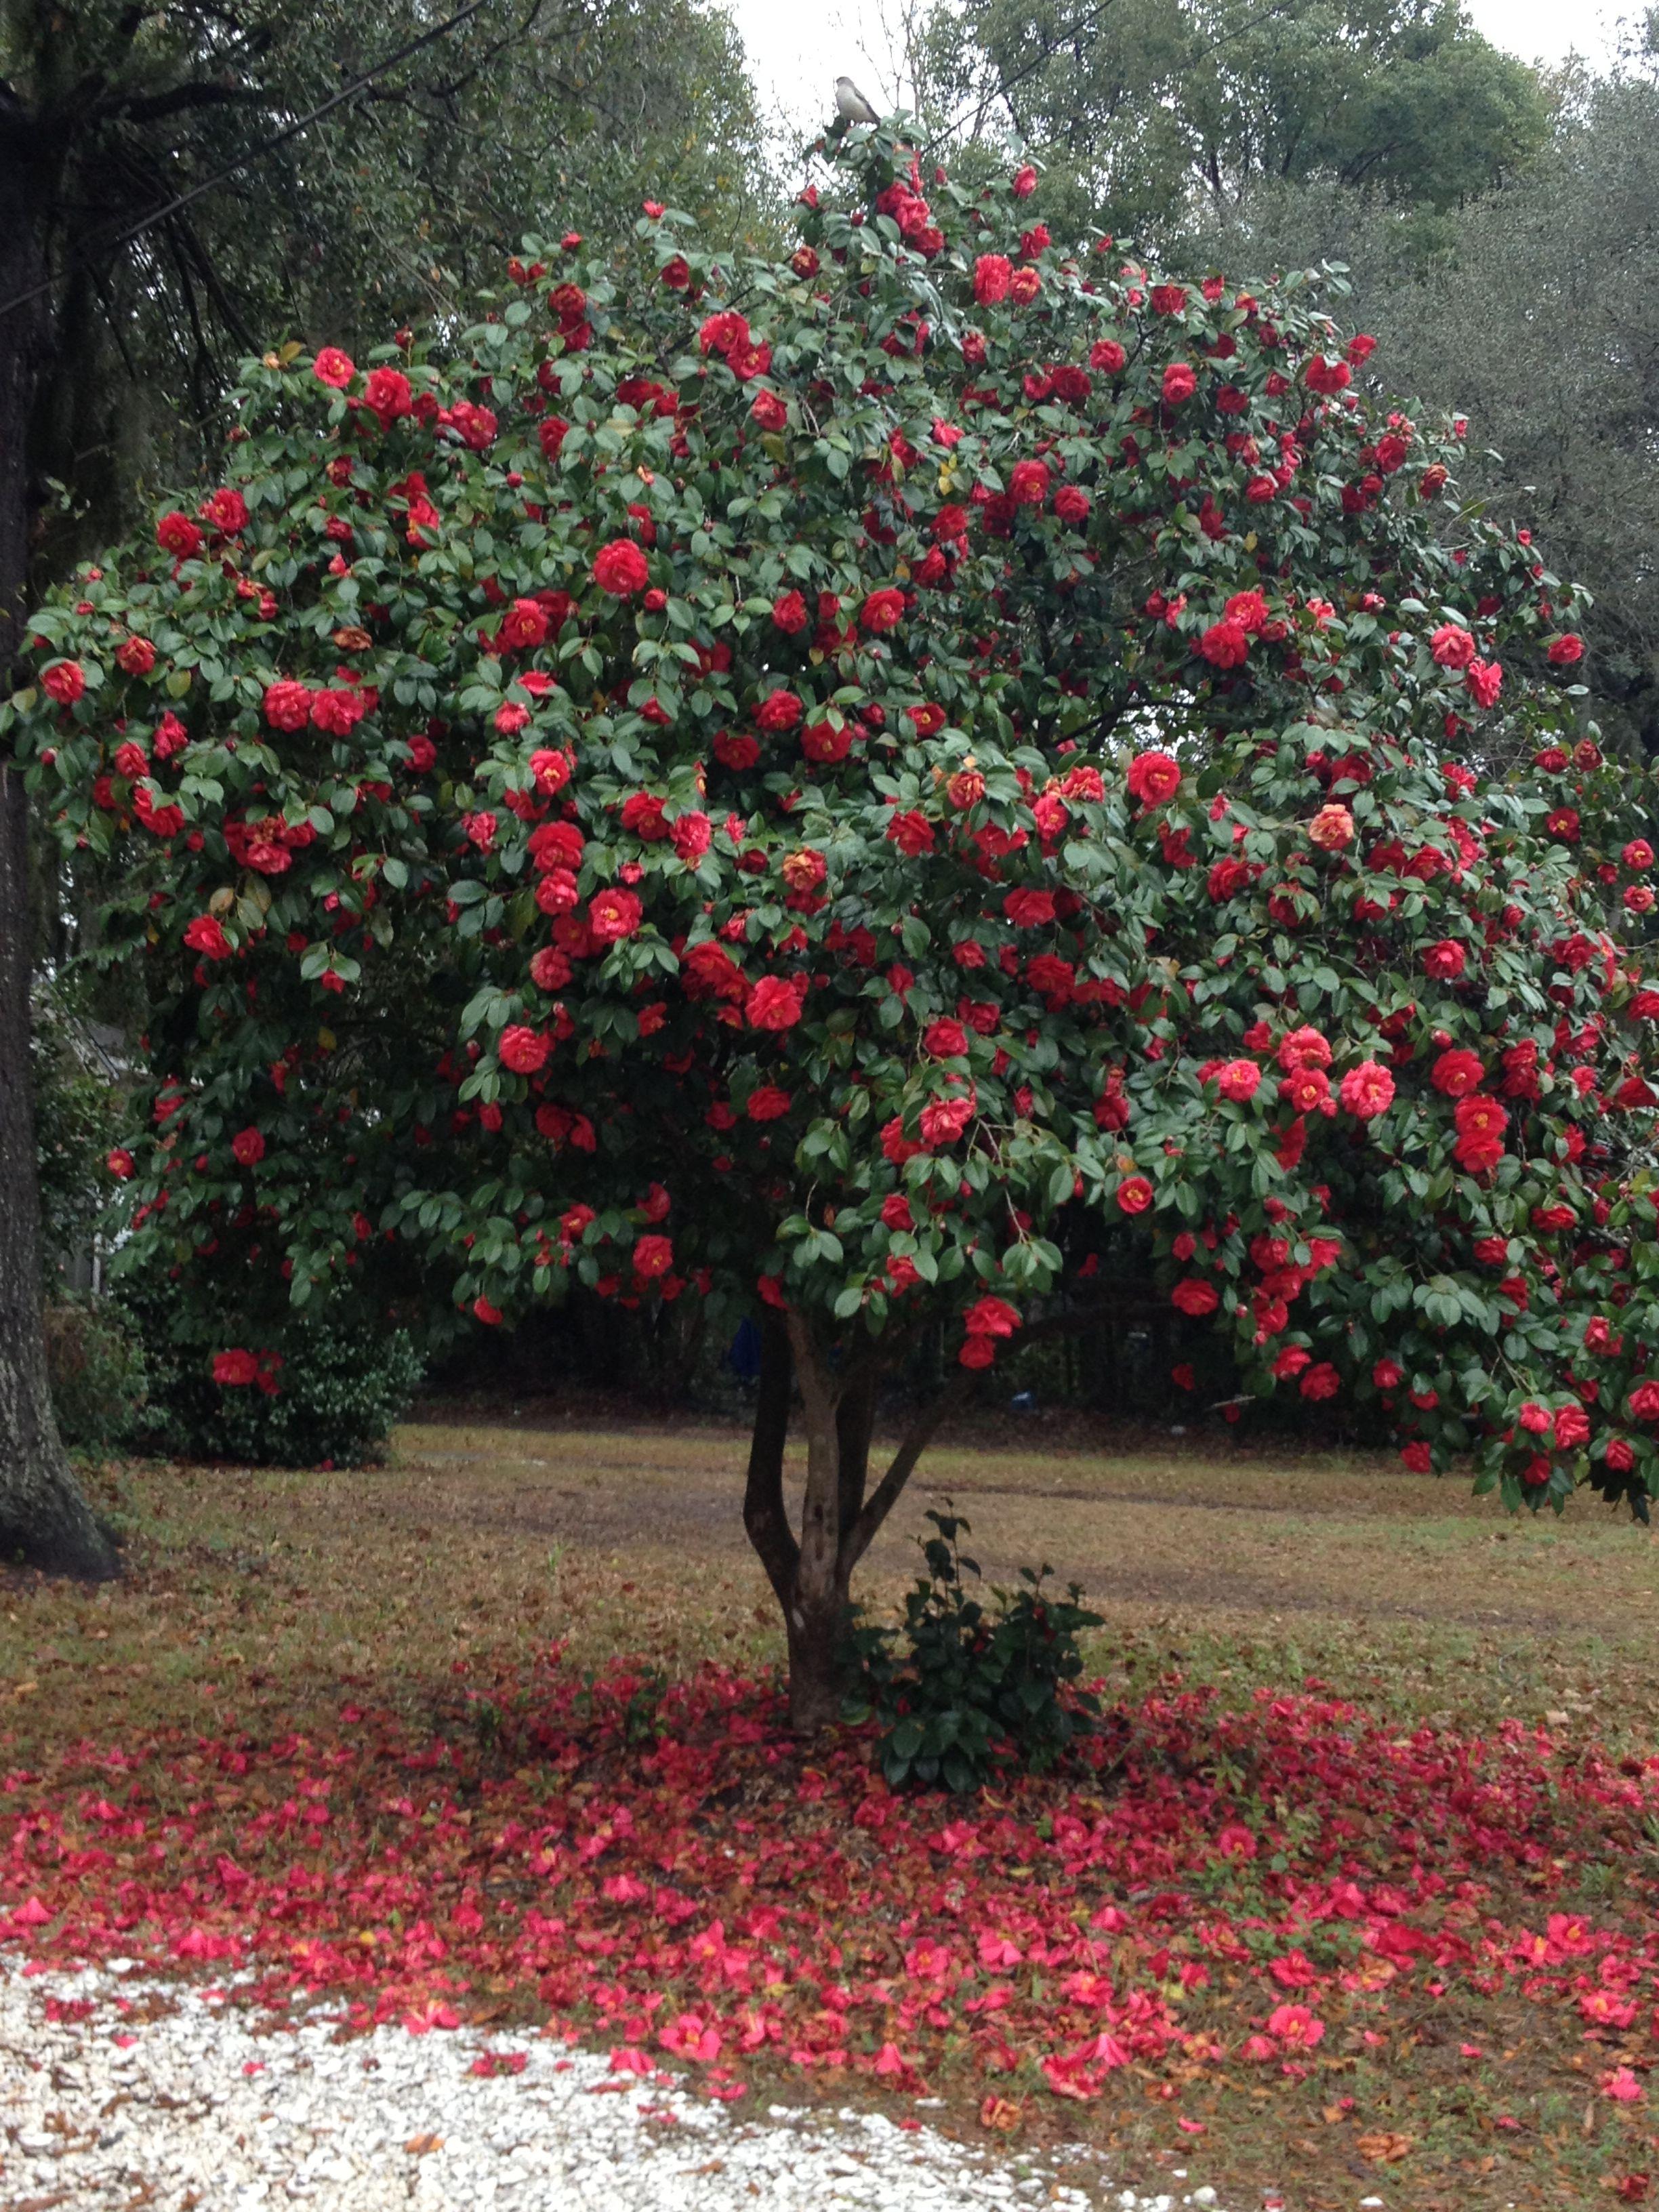 Camellia In 2020 Rose Garden Landscape Camellia Tree Garden Inspiration